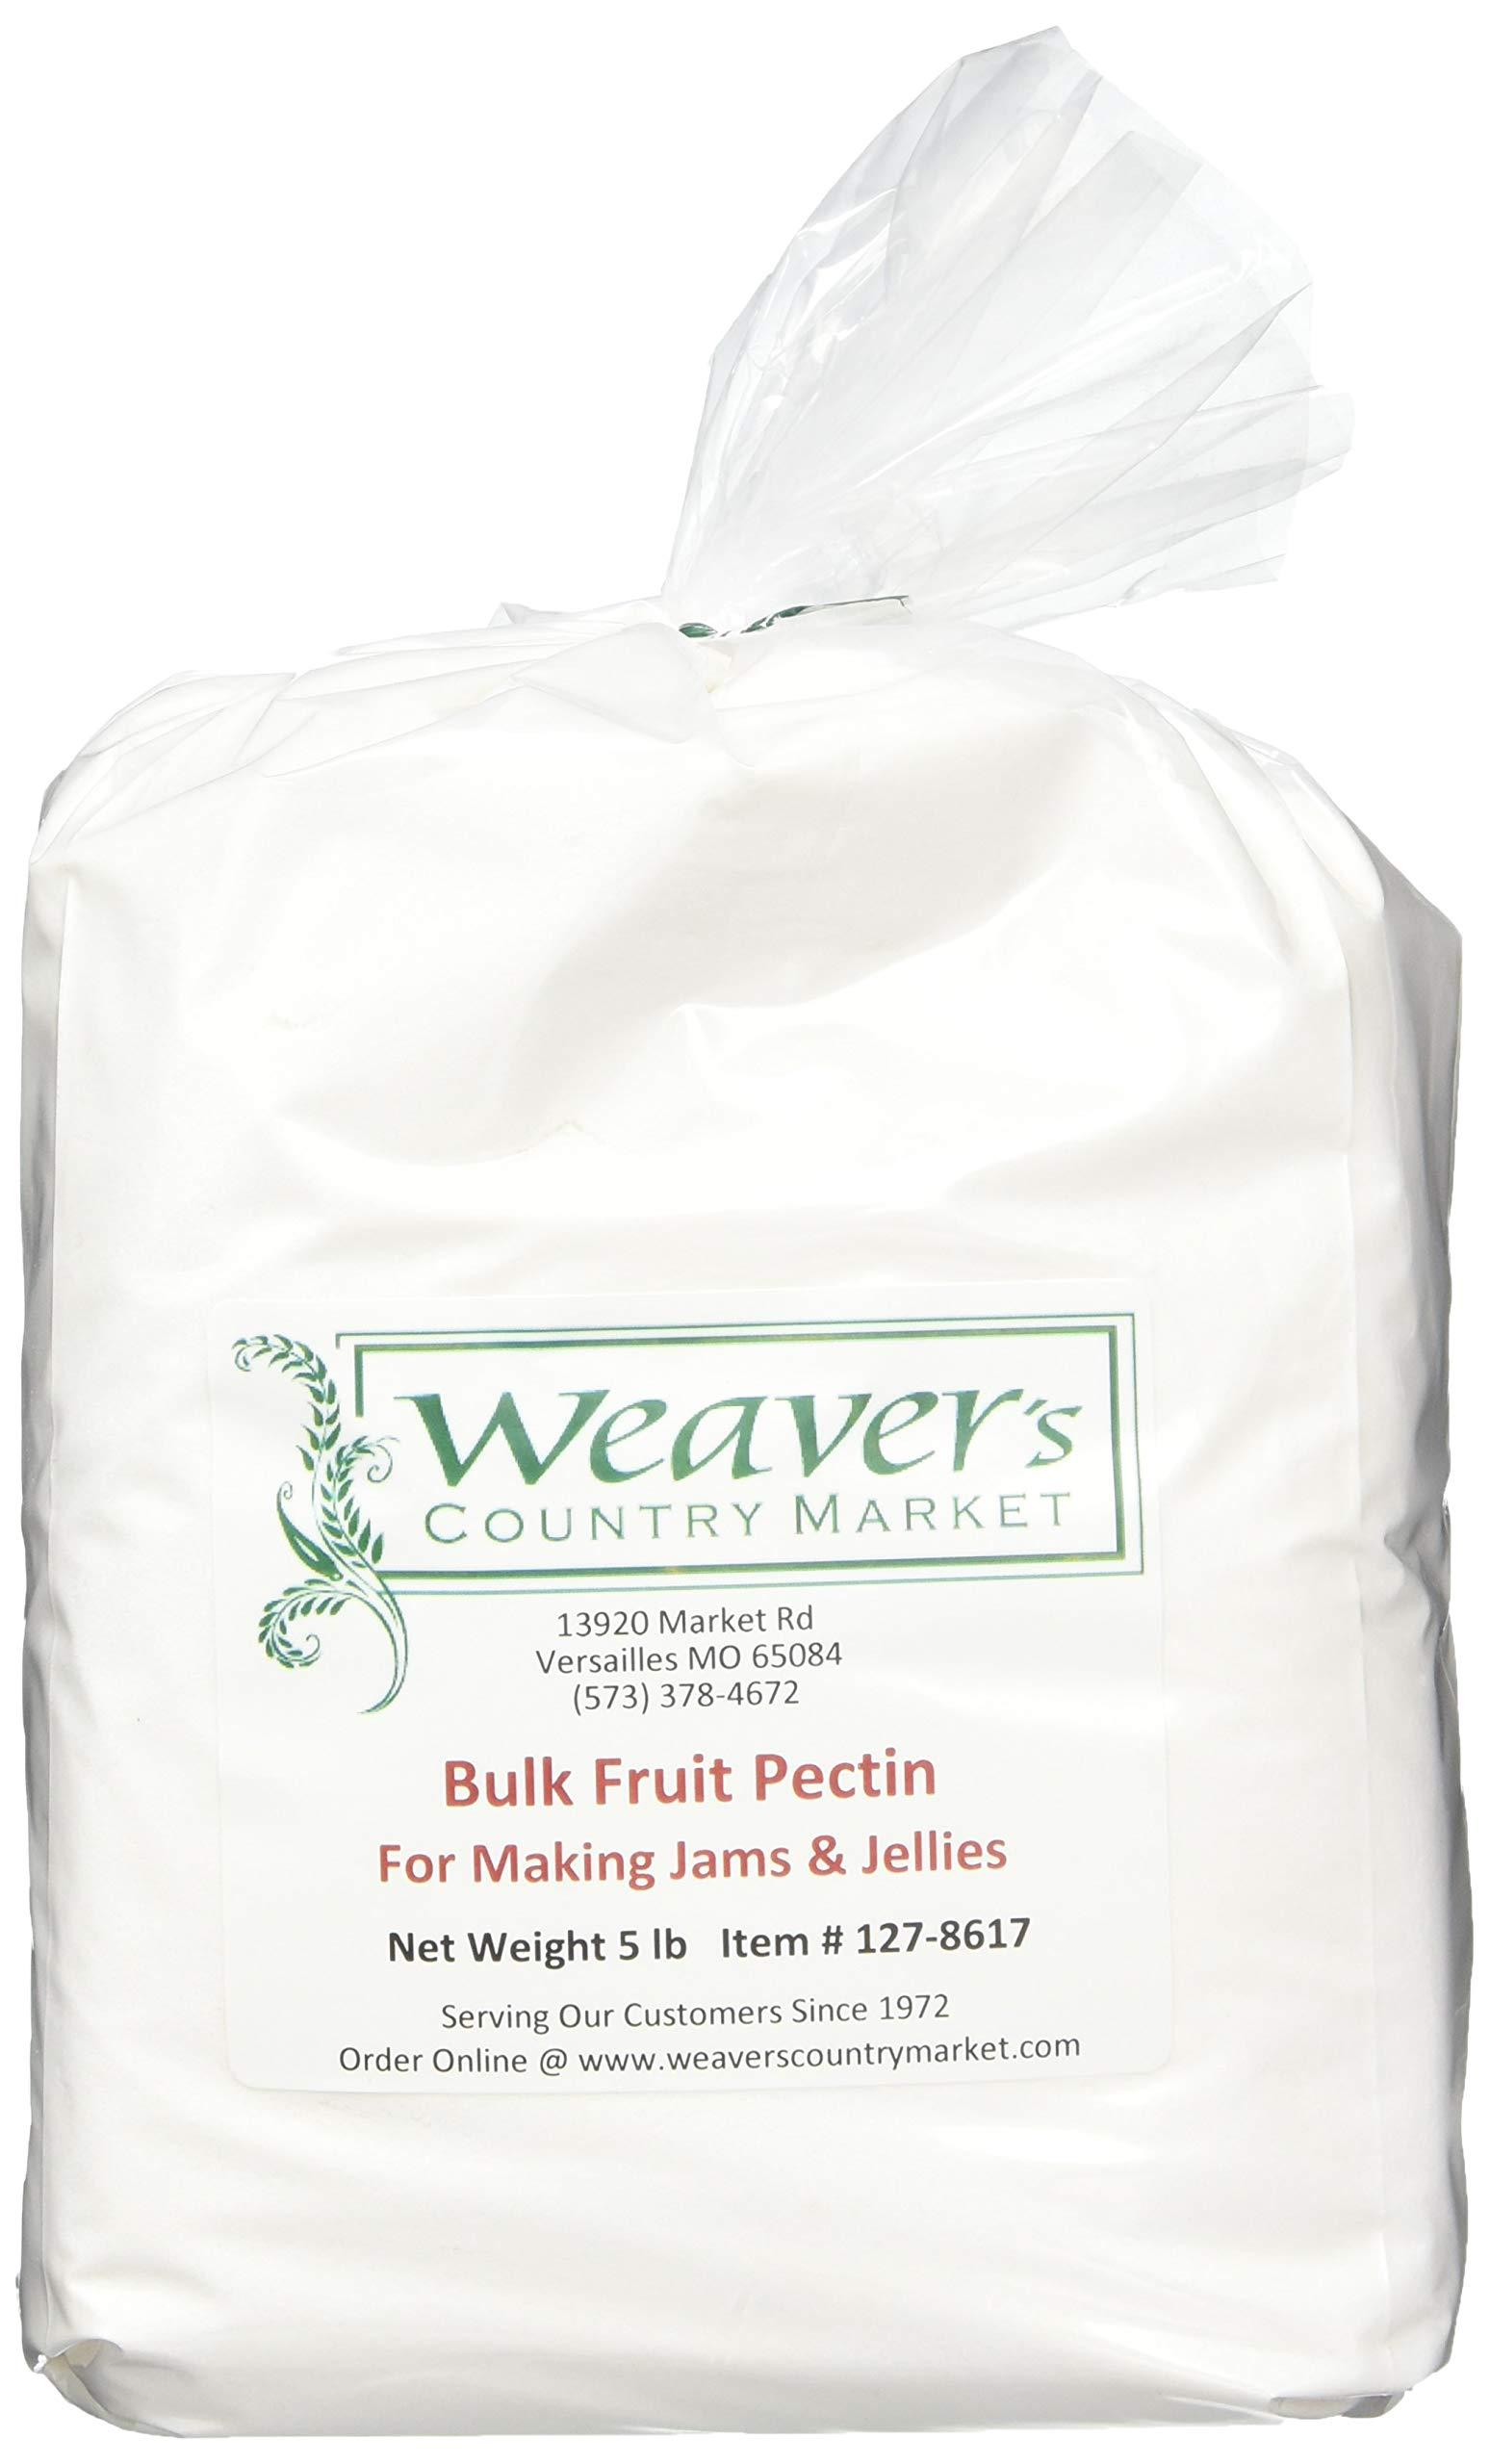 Weaver's Country Market Bulk Fruit Pectin Mix for Making Jams & Jellies (5 Lb. Plastic Bag)